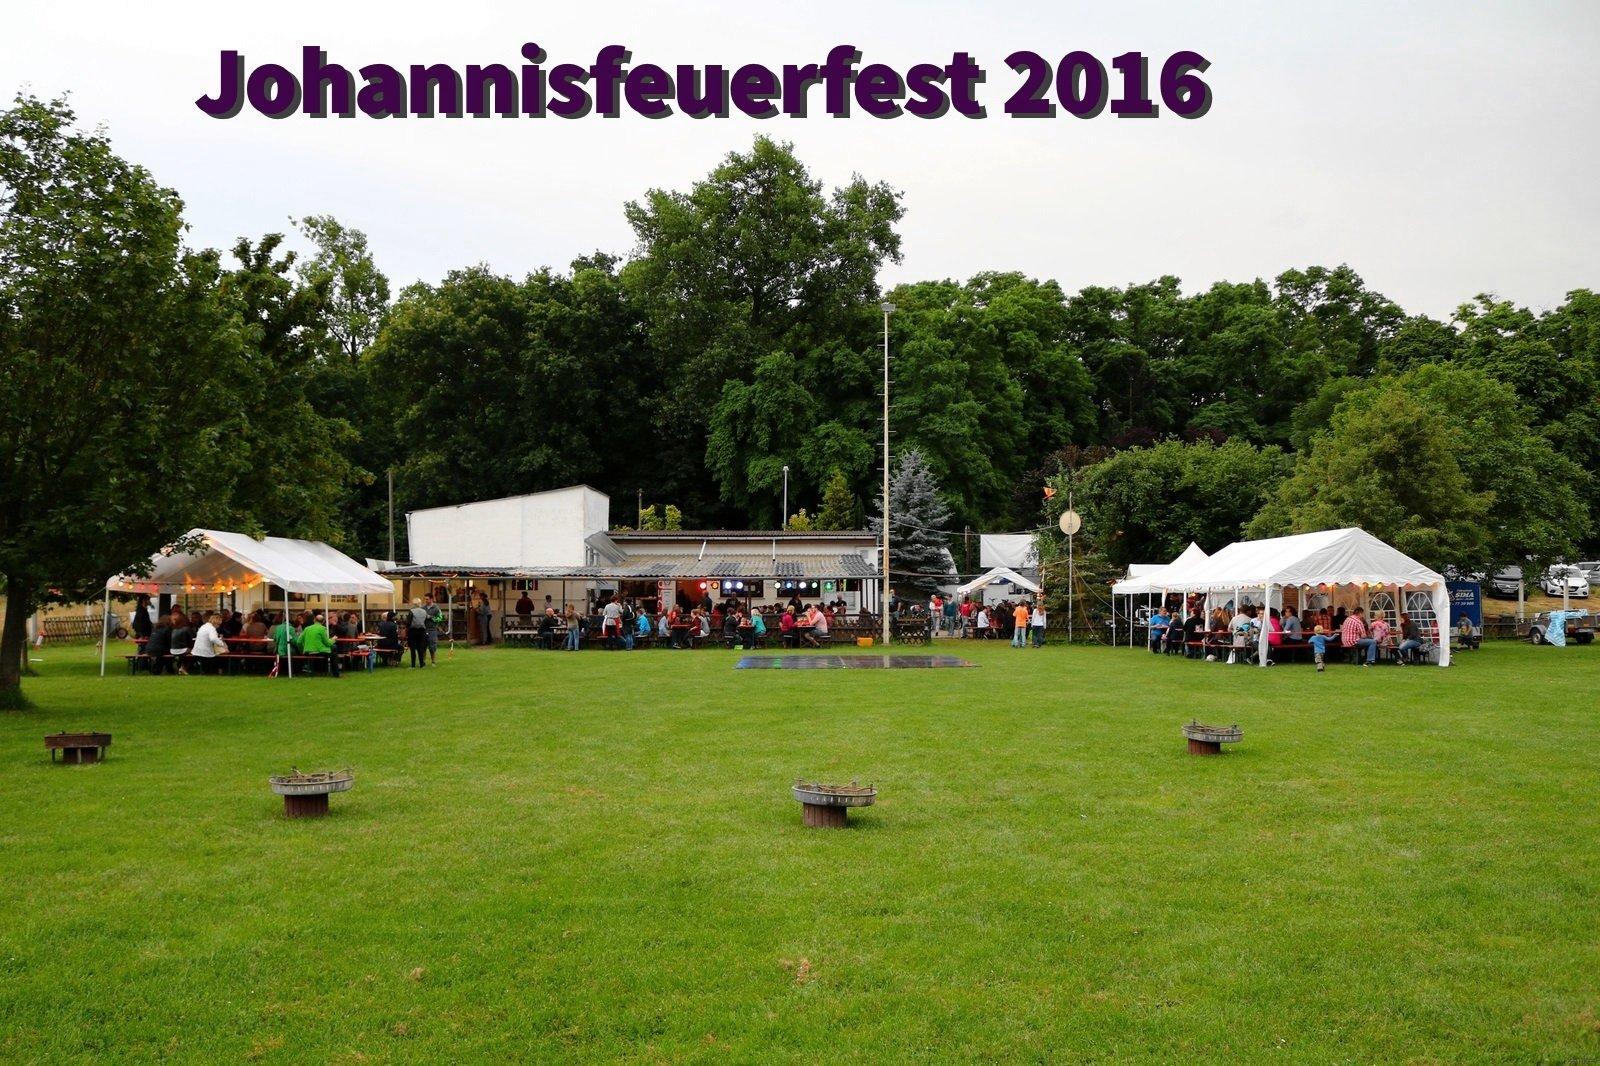 Johannisfeuerfest 2016